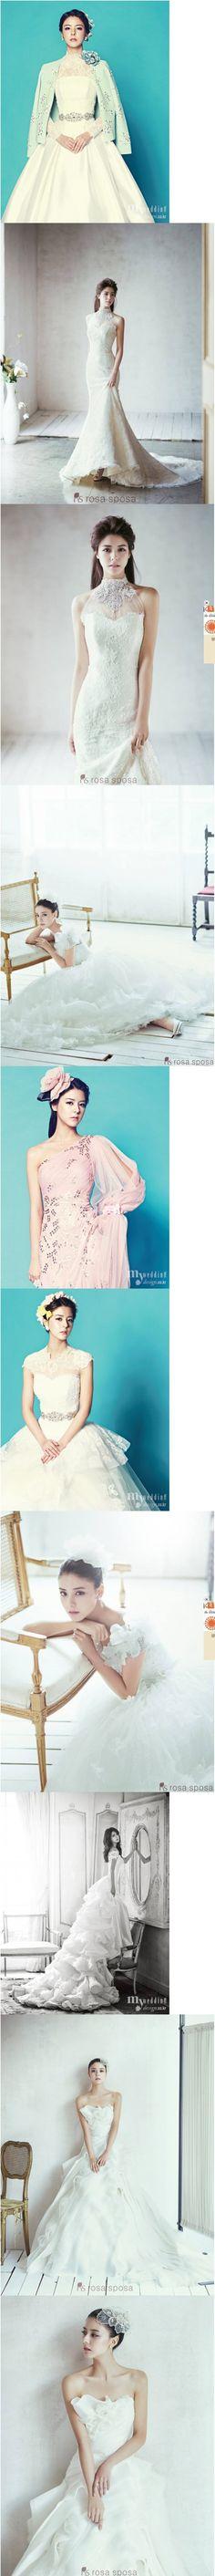 Korea Actress 2015 후지이 미나